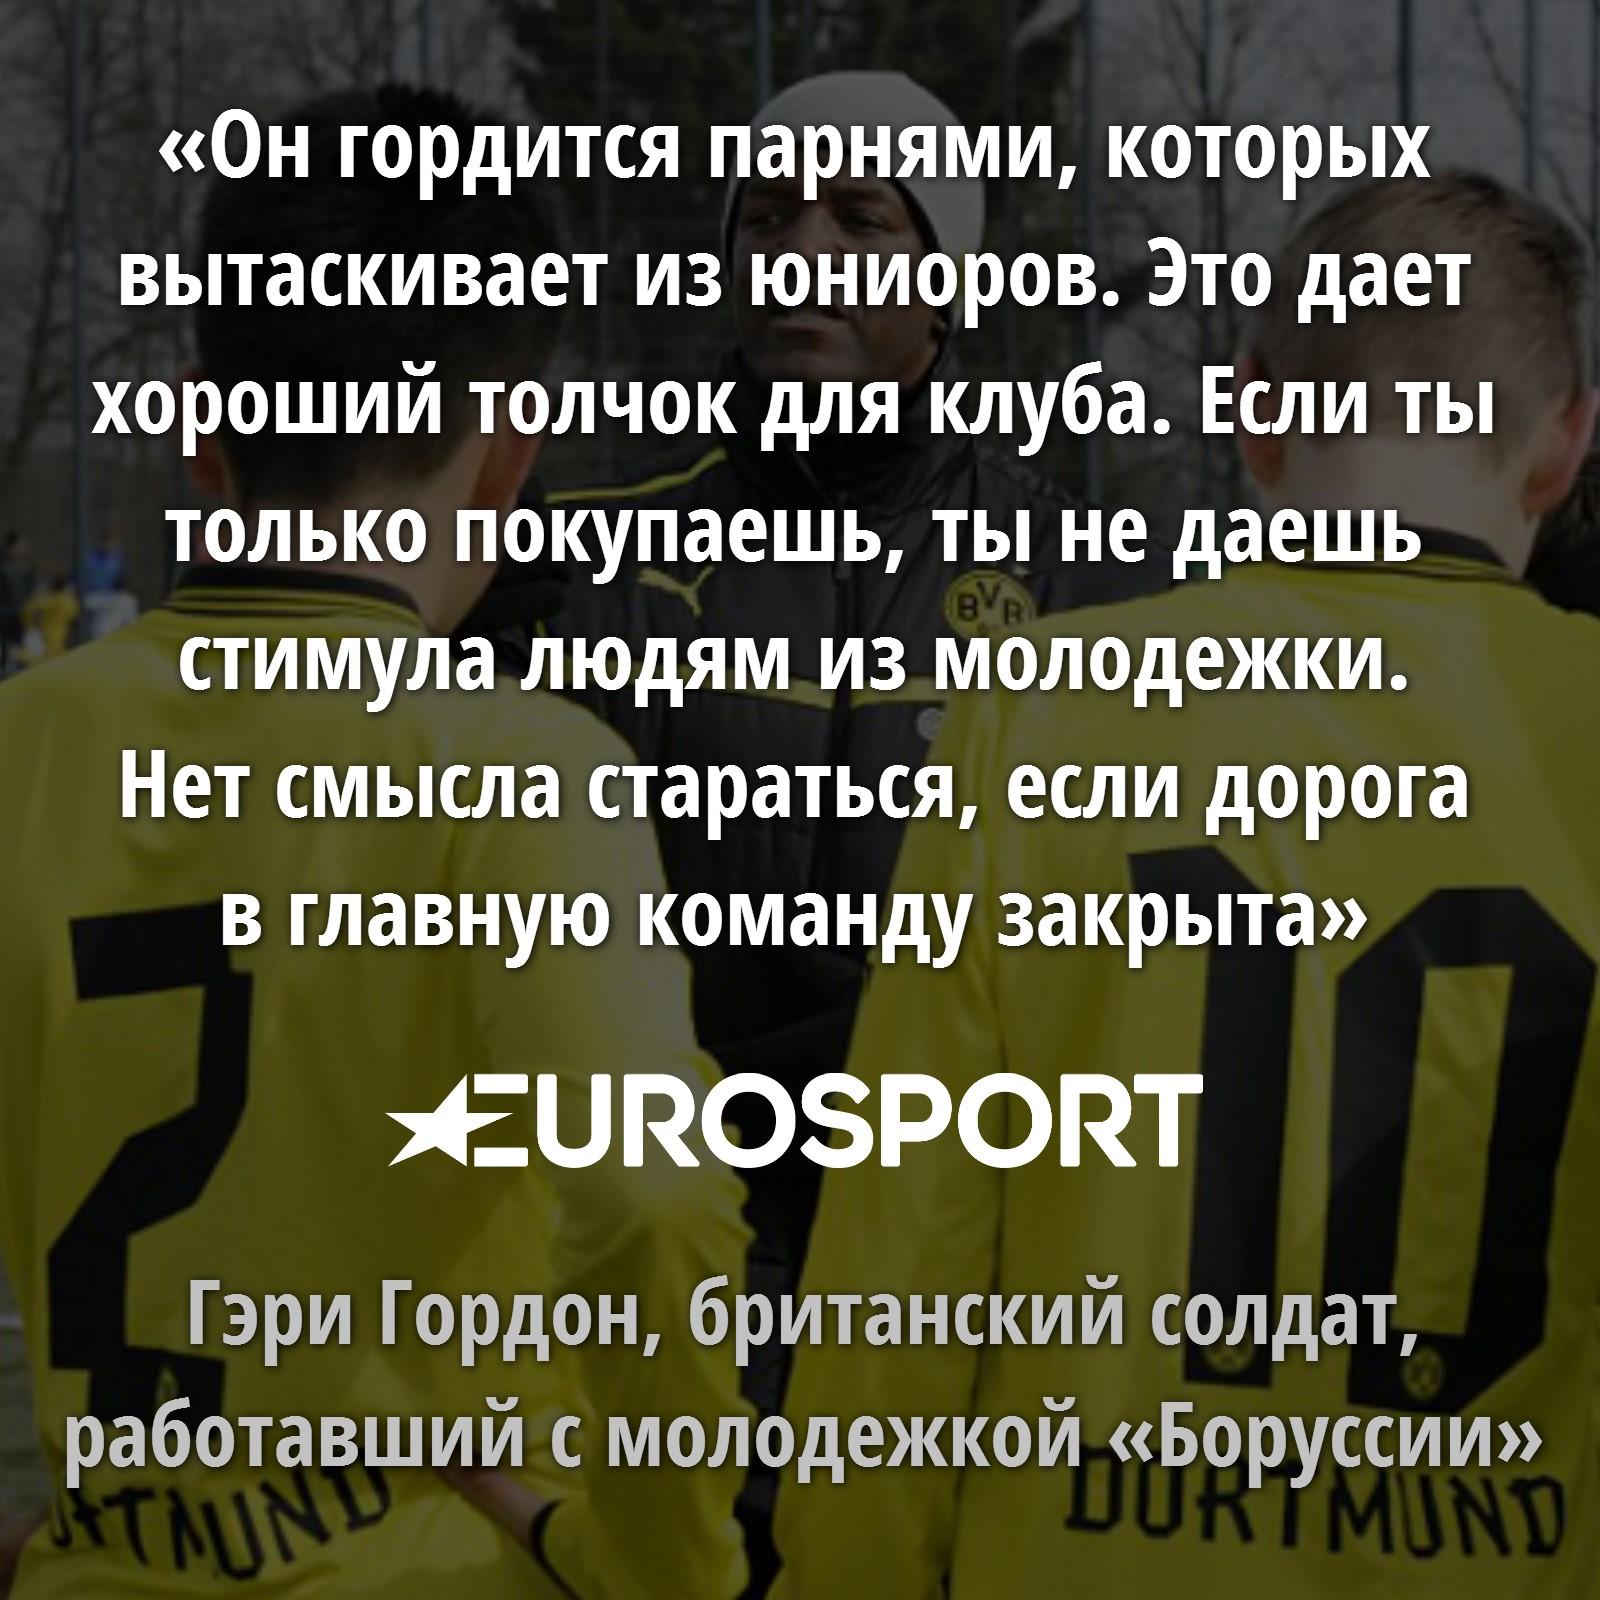 https://i.eurosport.com/2015/11/19/1735208.jpg